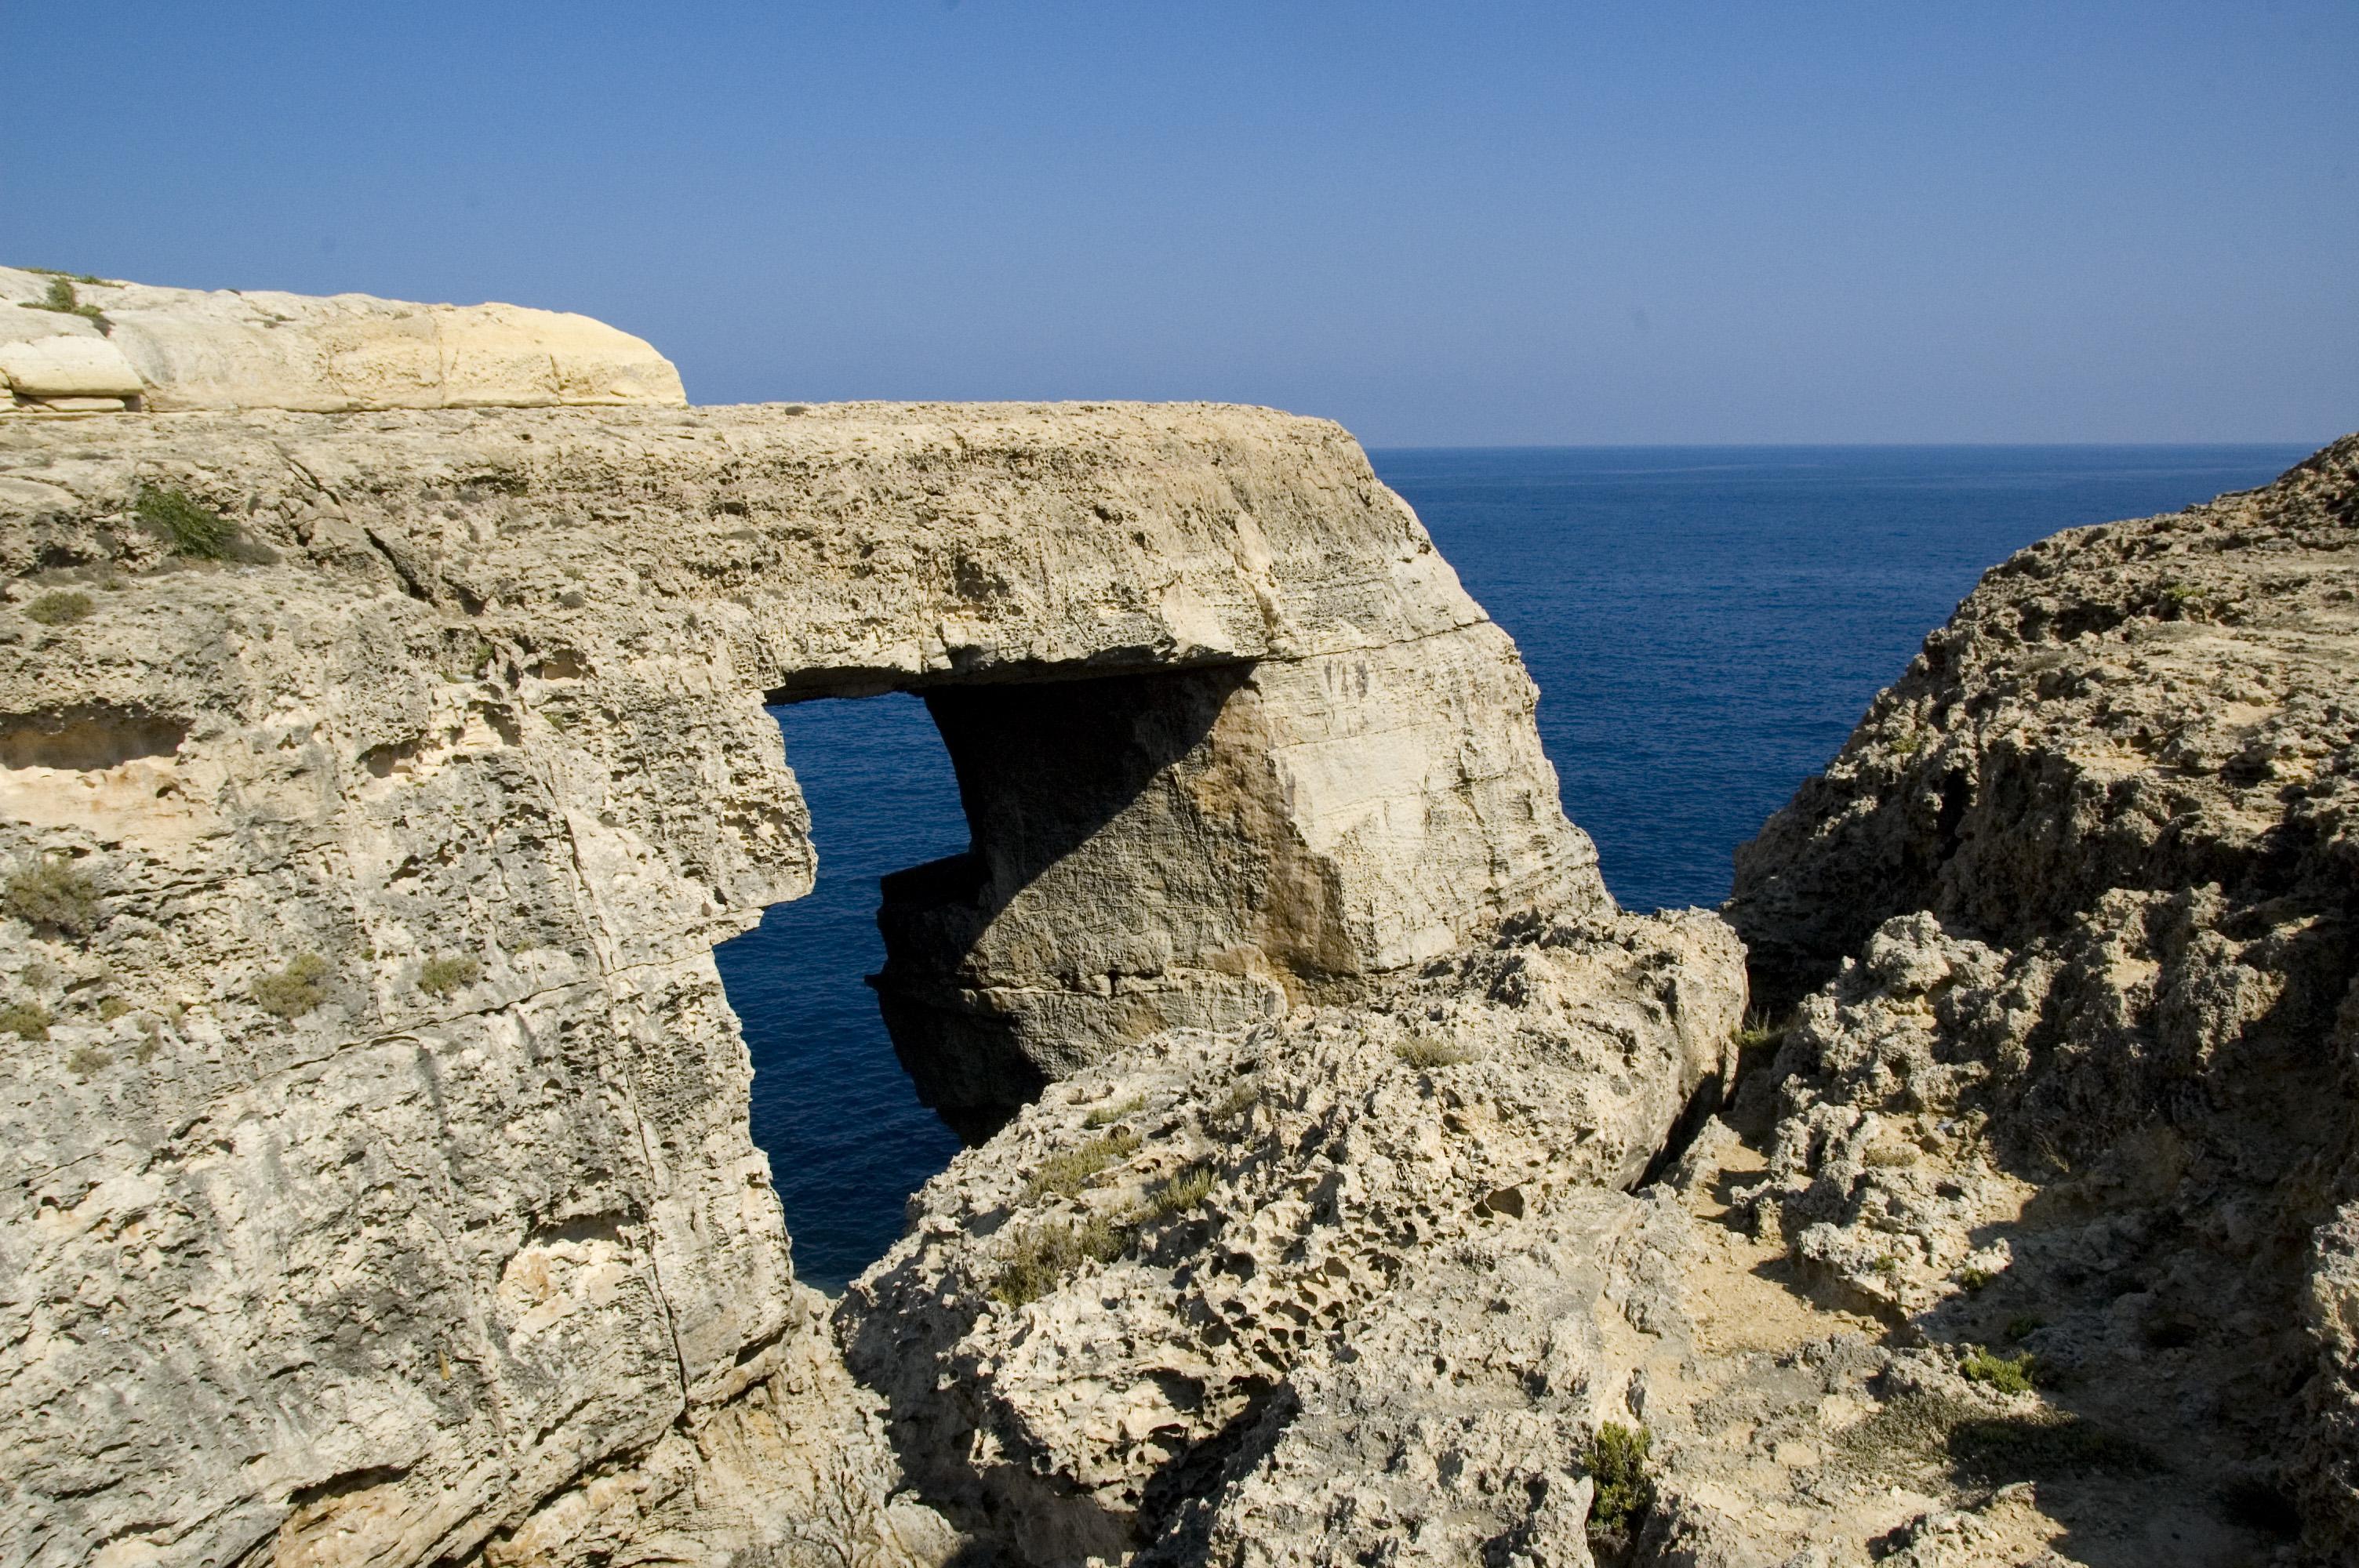 malta mourns azure window loss cnn travel